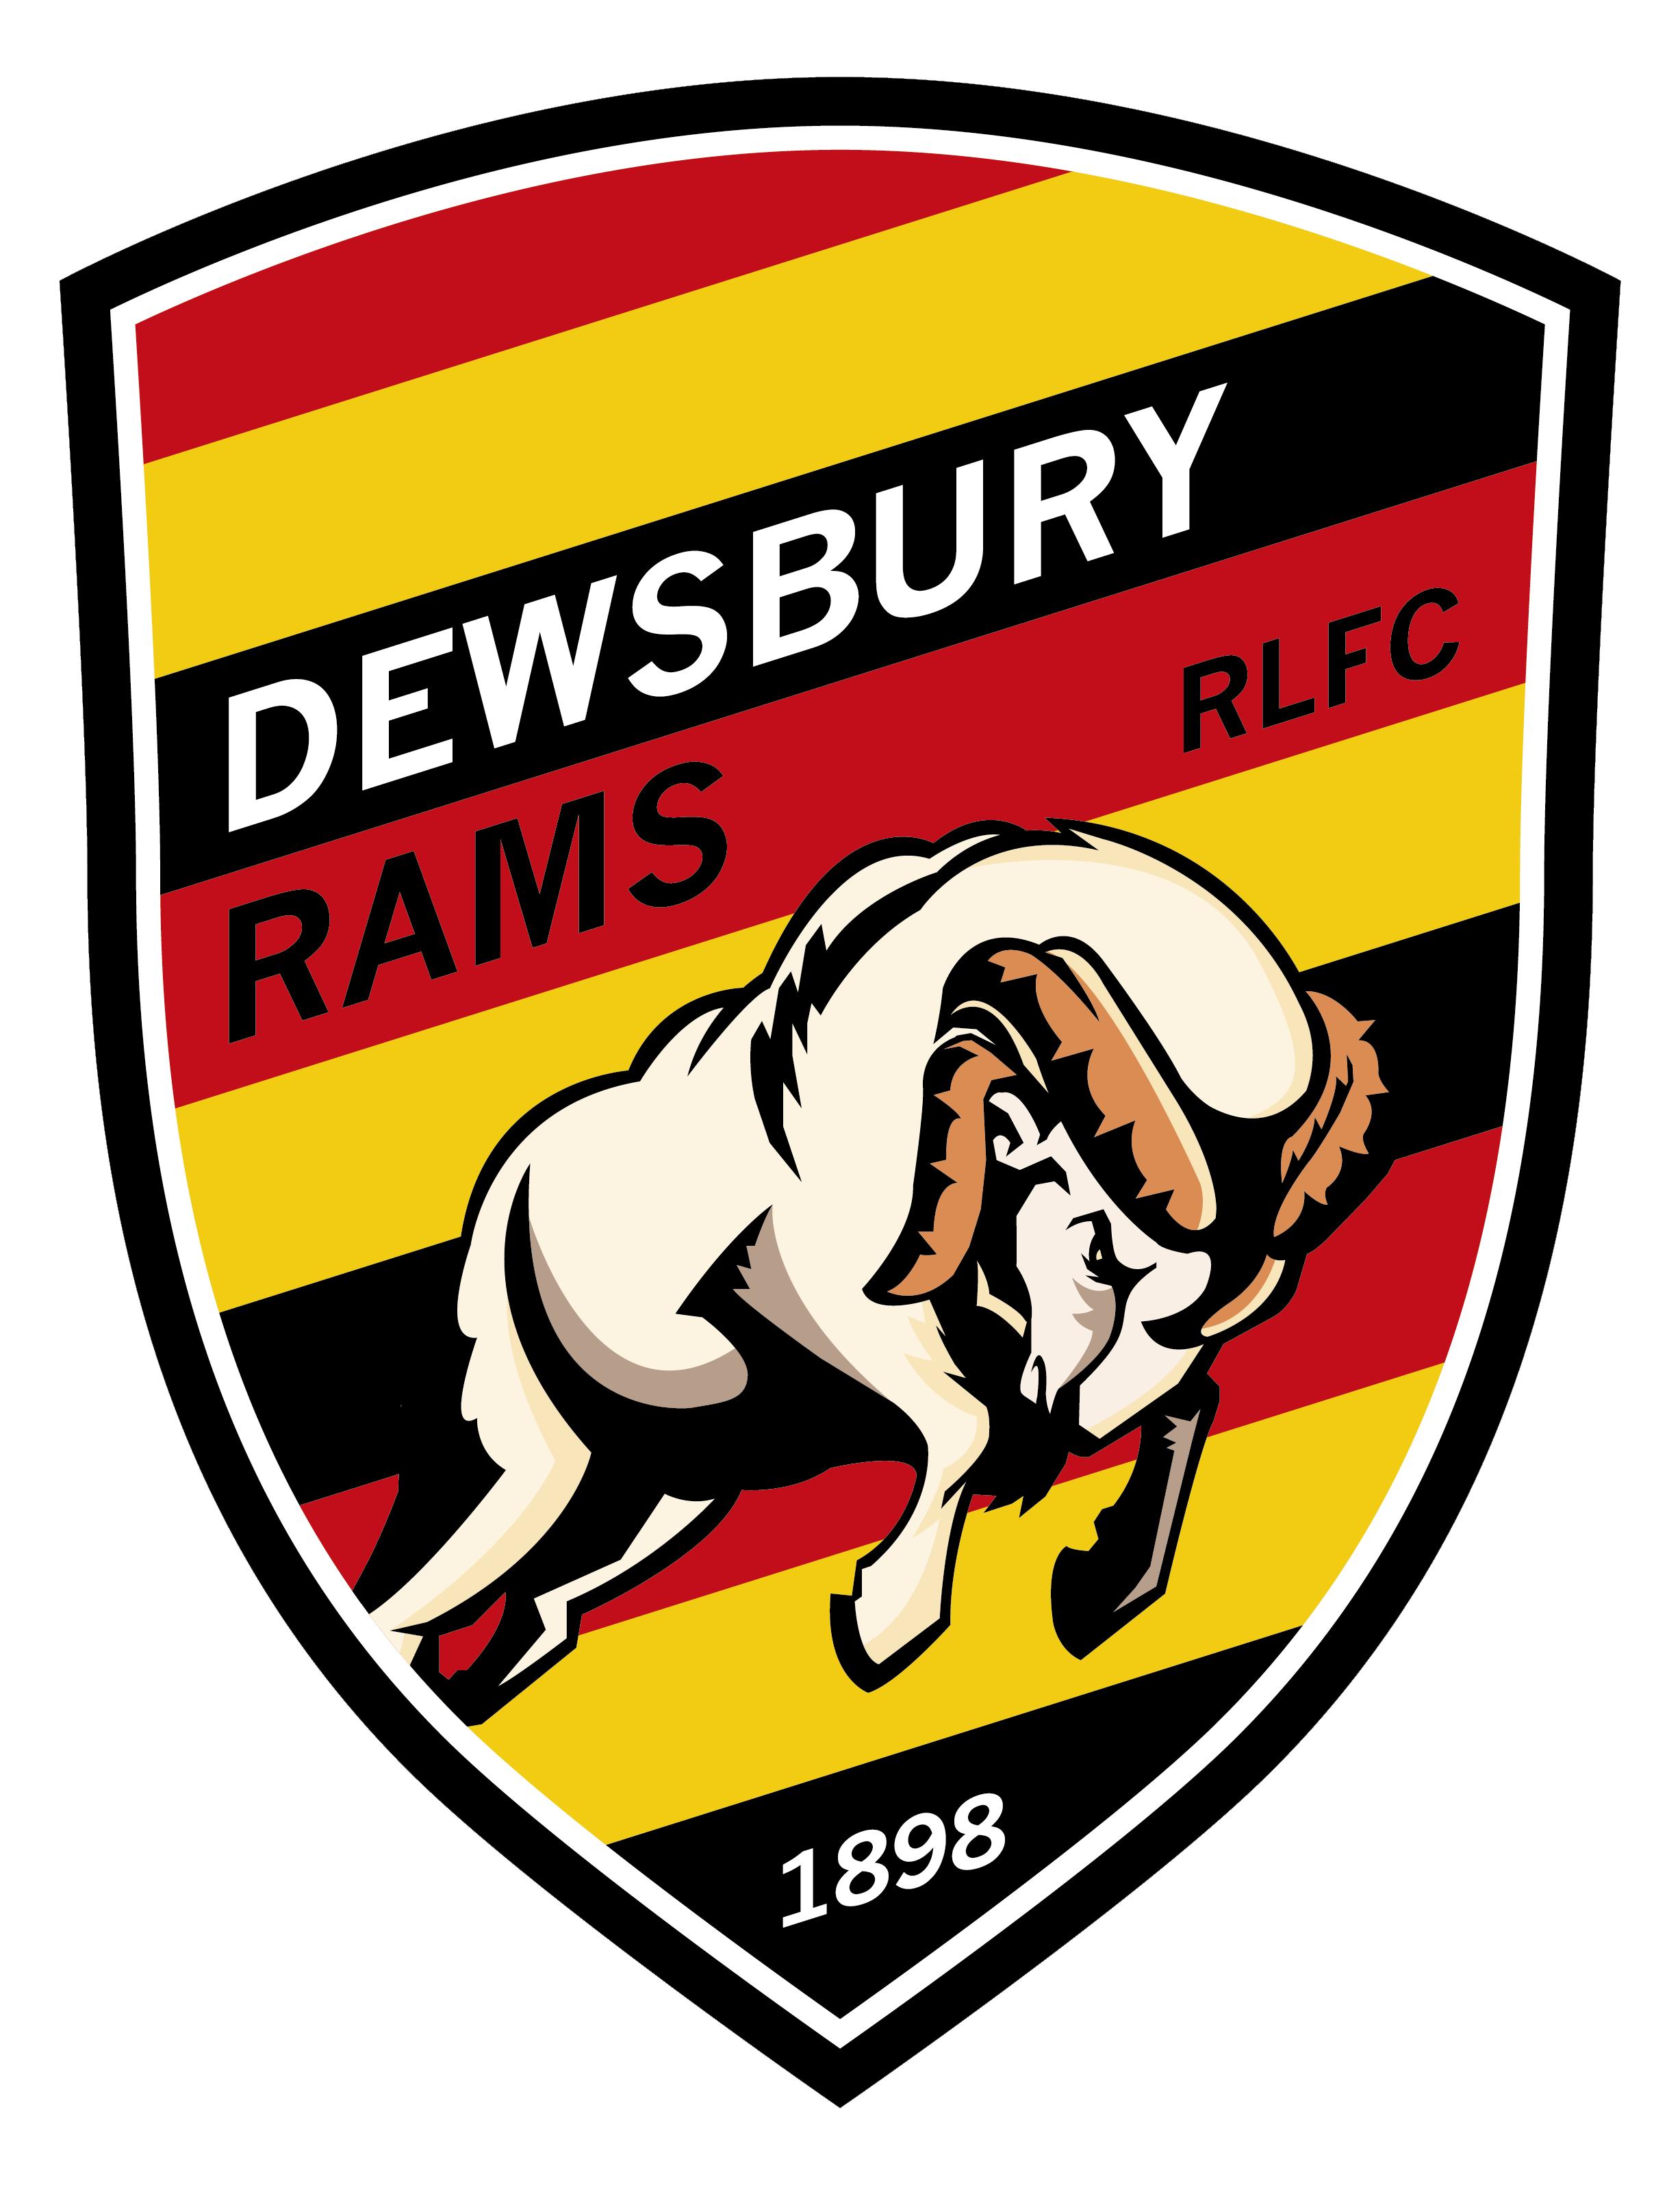 Dewsbury Rams badge